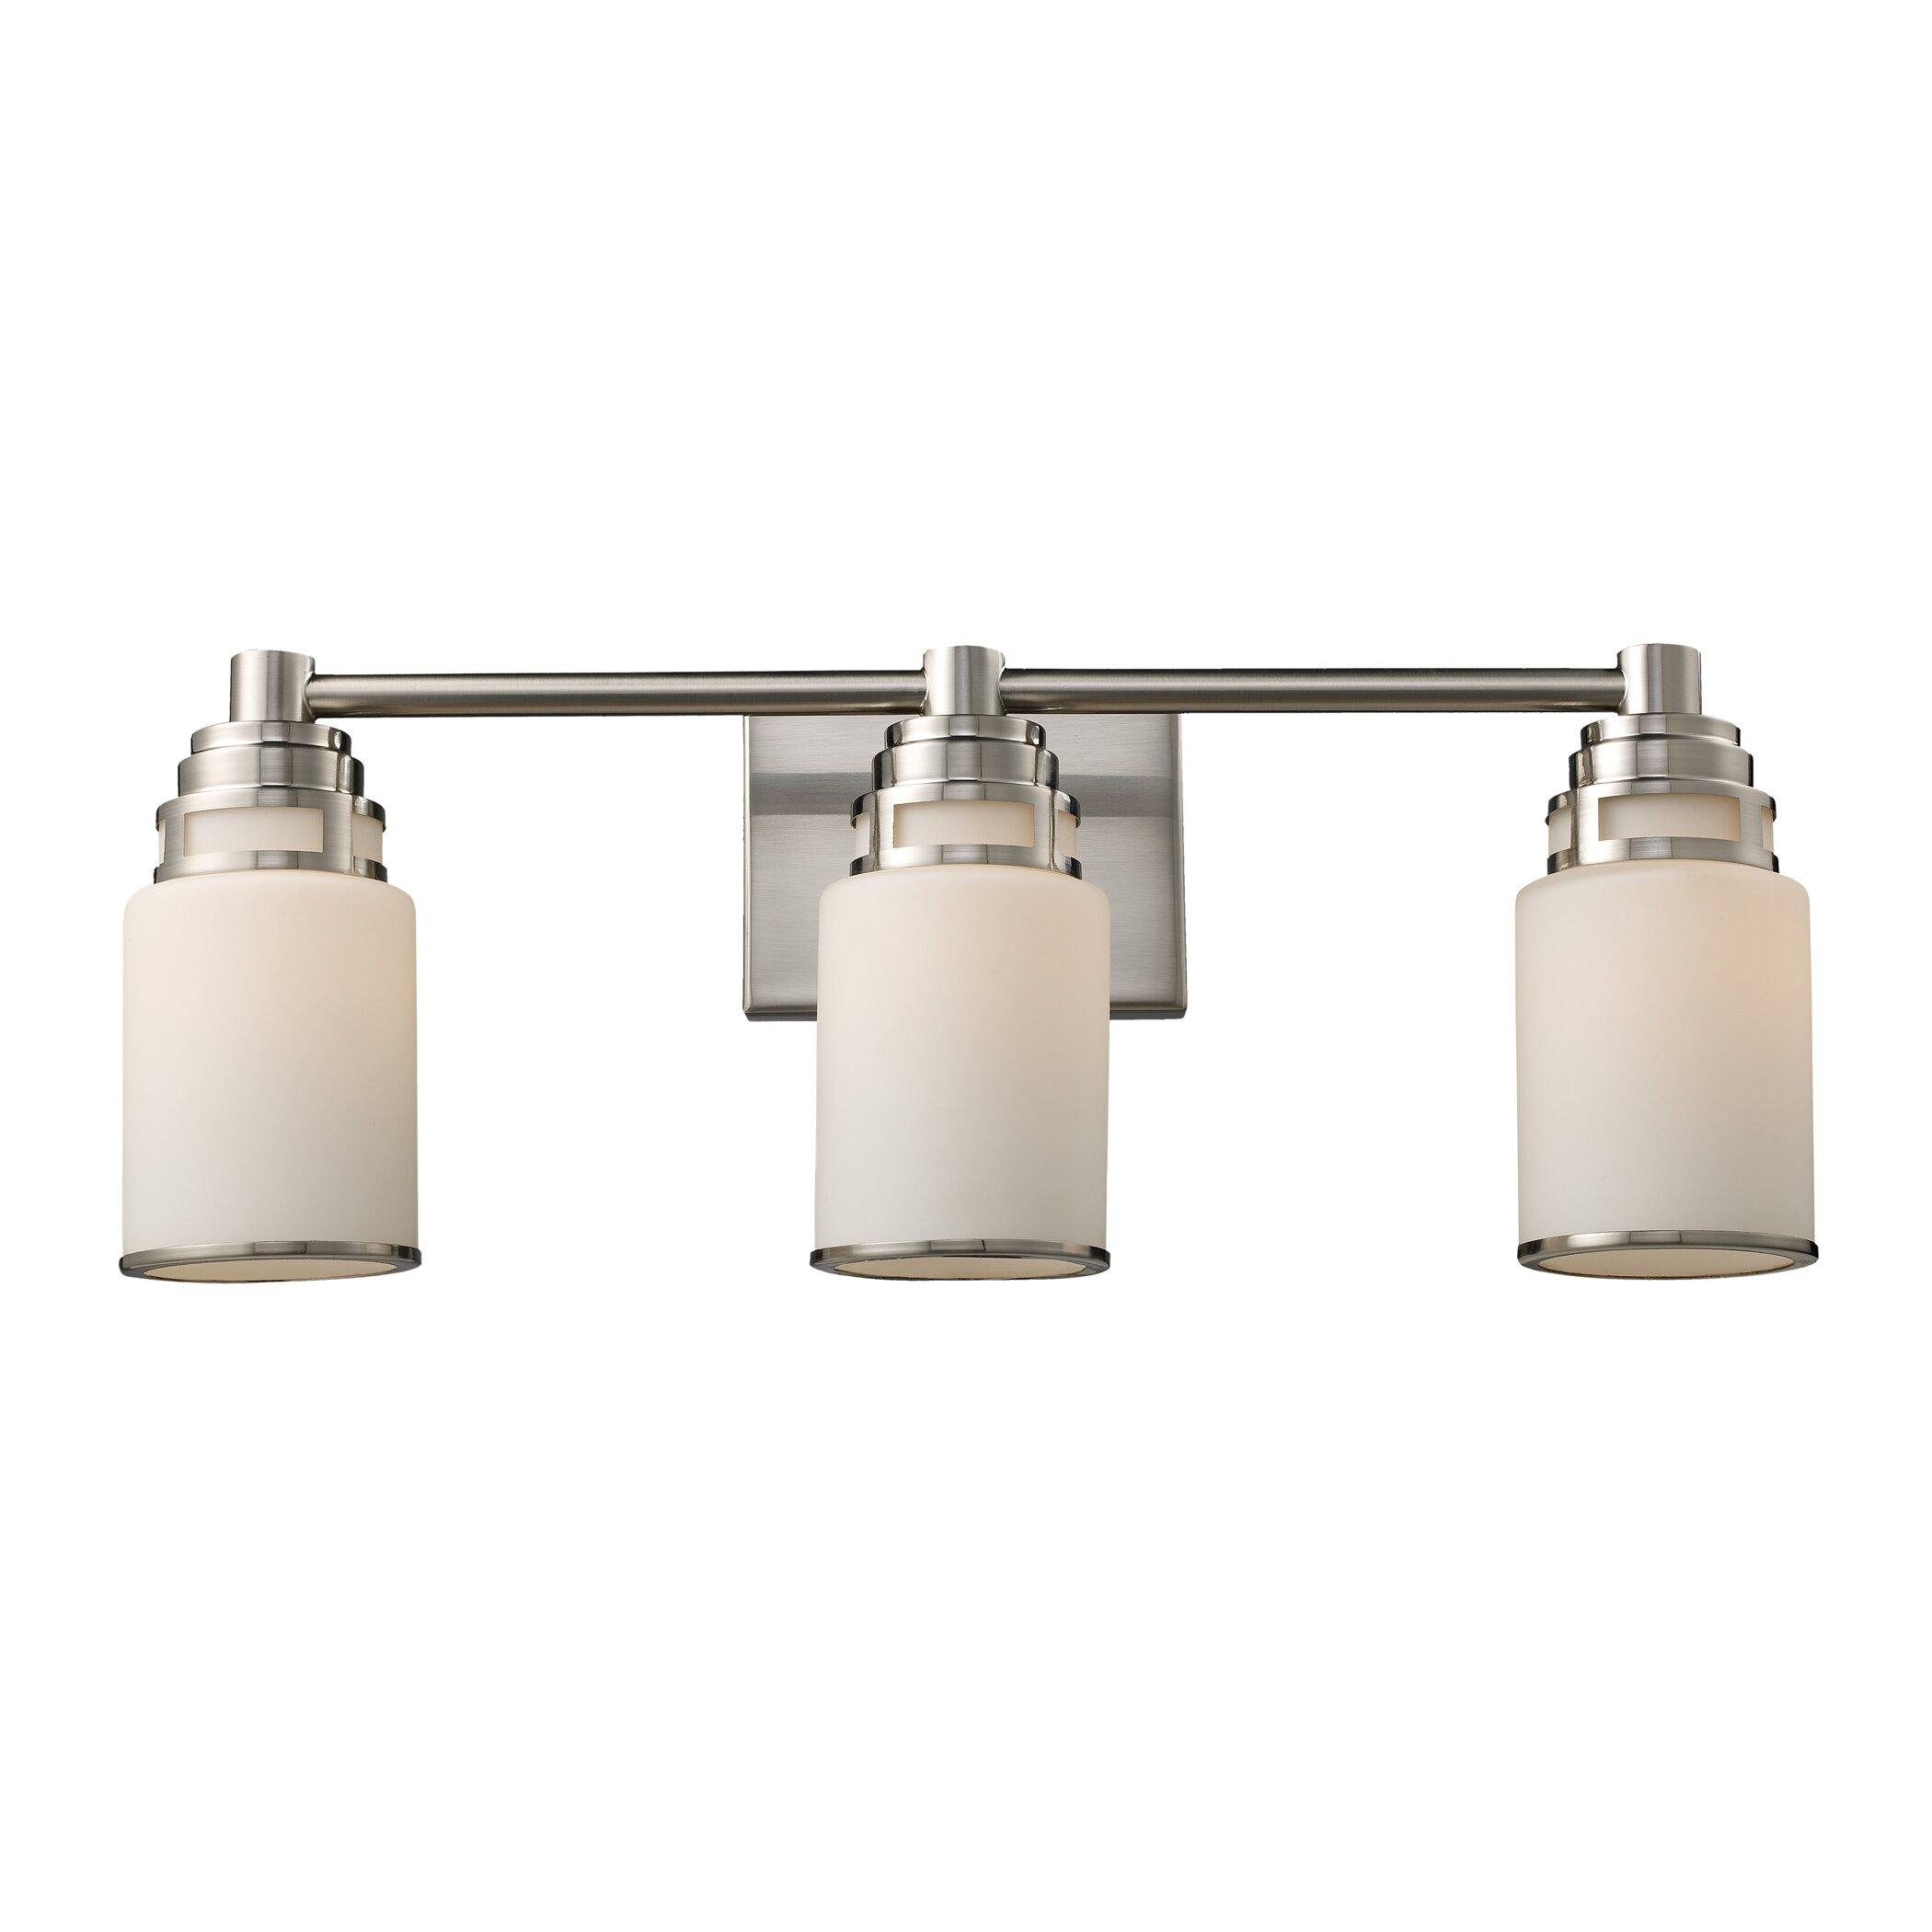 Elk lighting bryant 3 light bathroom vanity light for Elk bathroom lighting